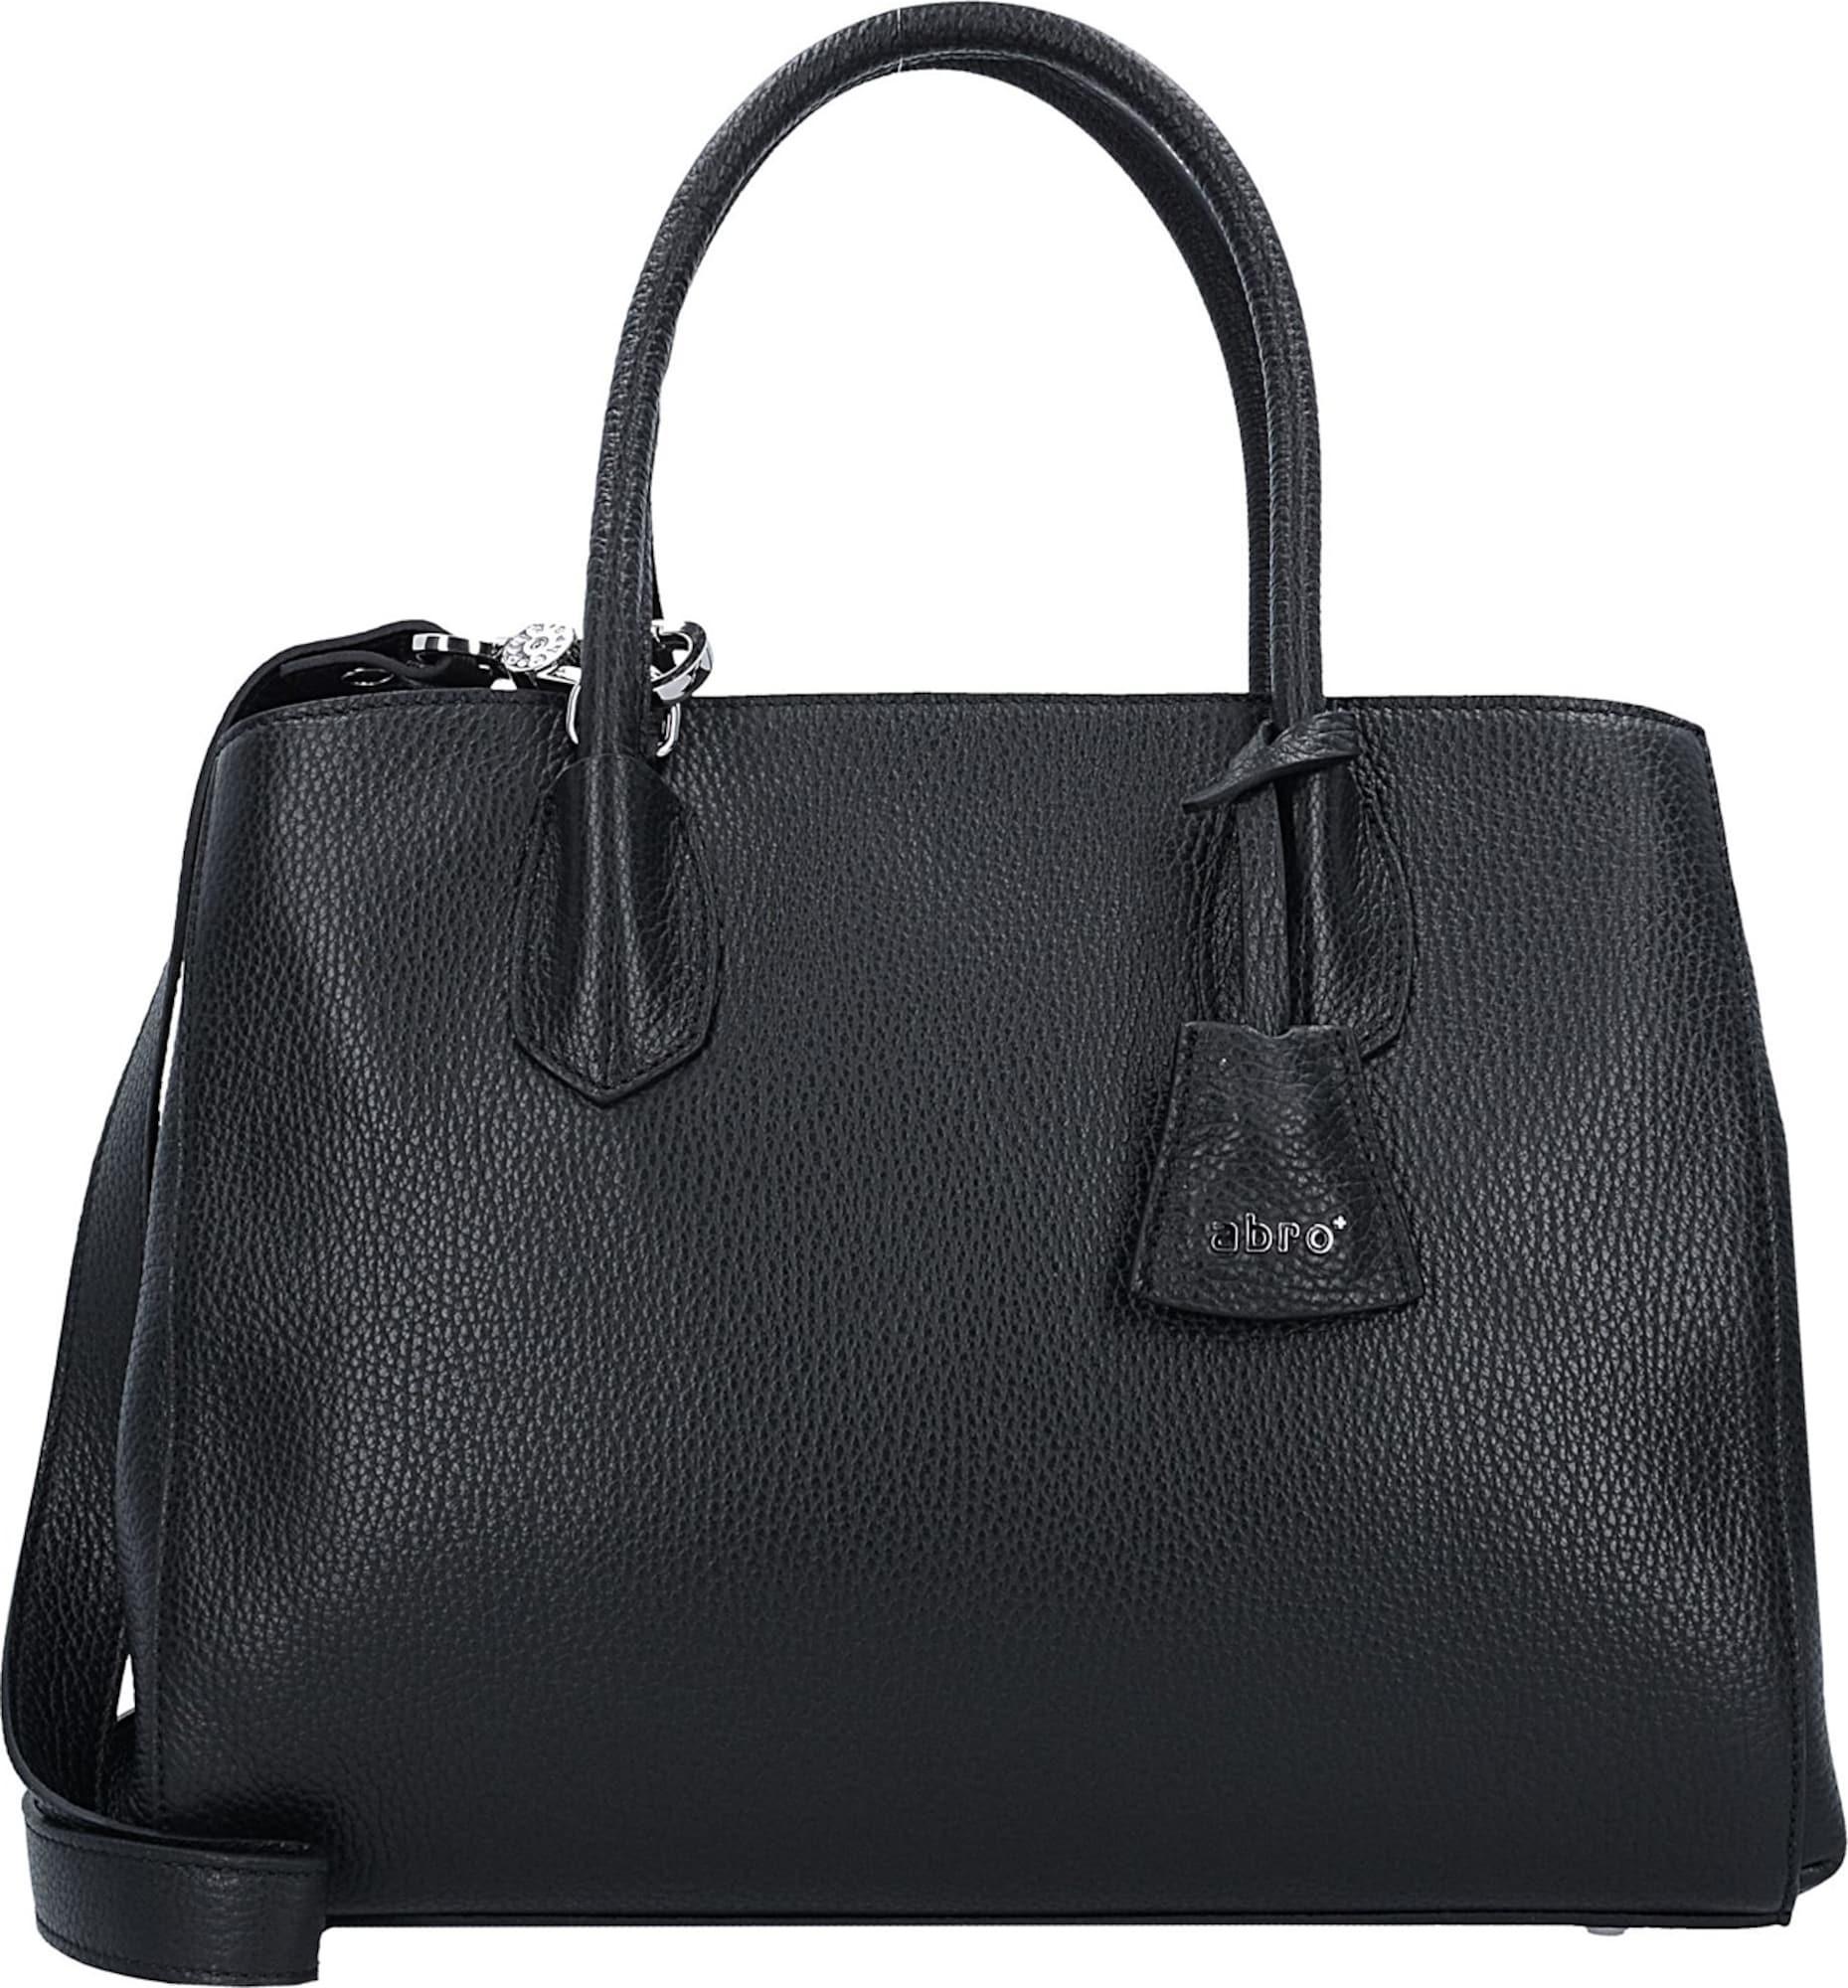 abro adria handtasche leder 32 cm in schwarz about you. Black Bedroom Furniture Sets. Home Design Ideas